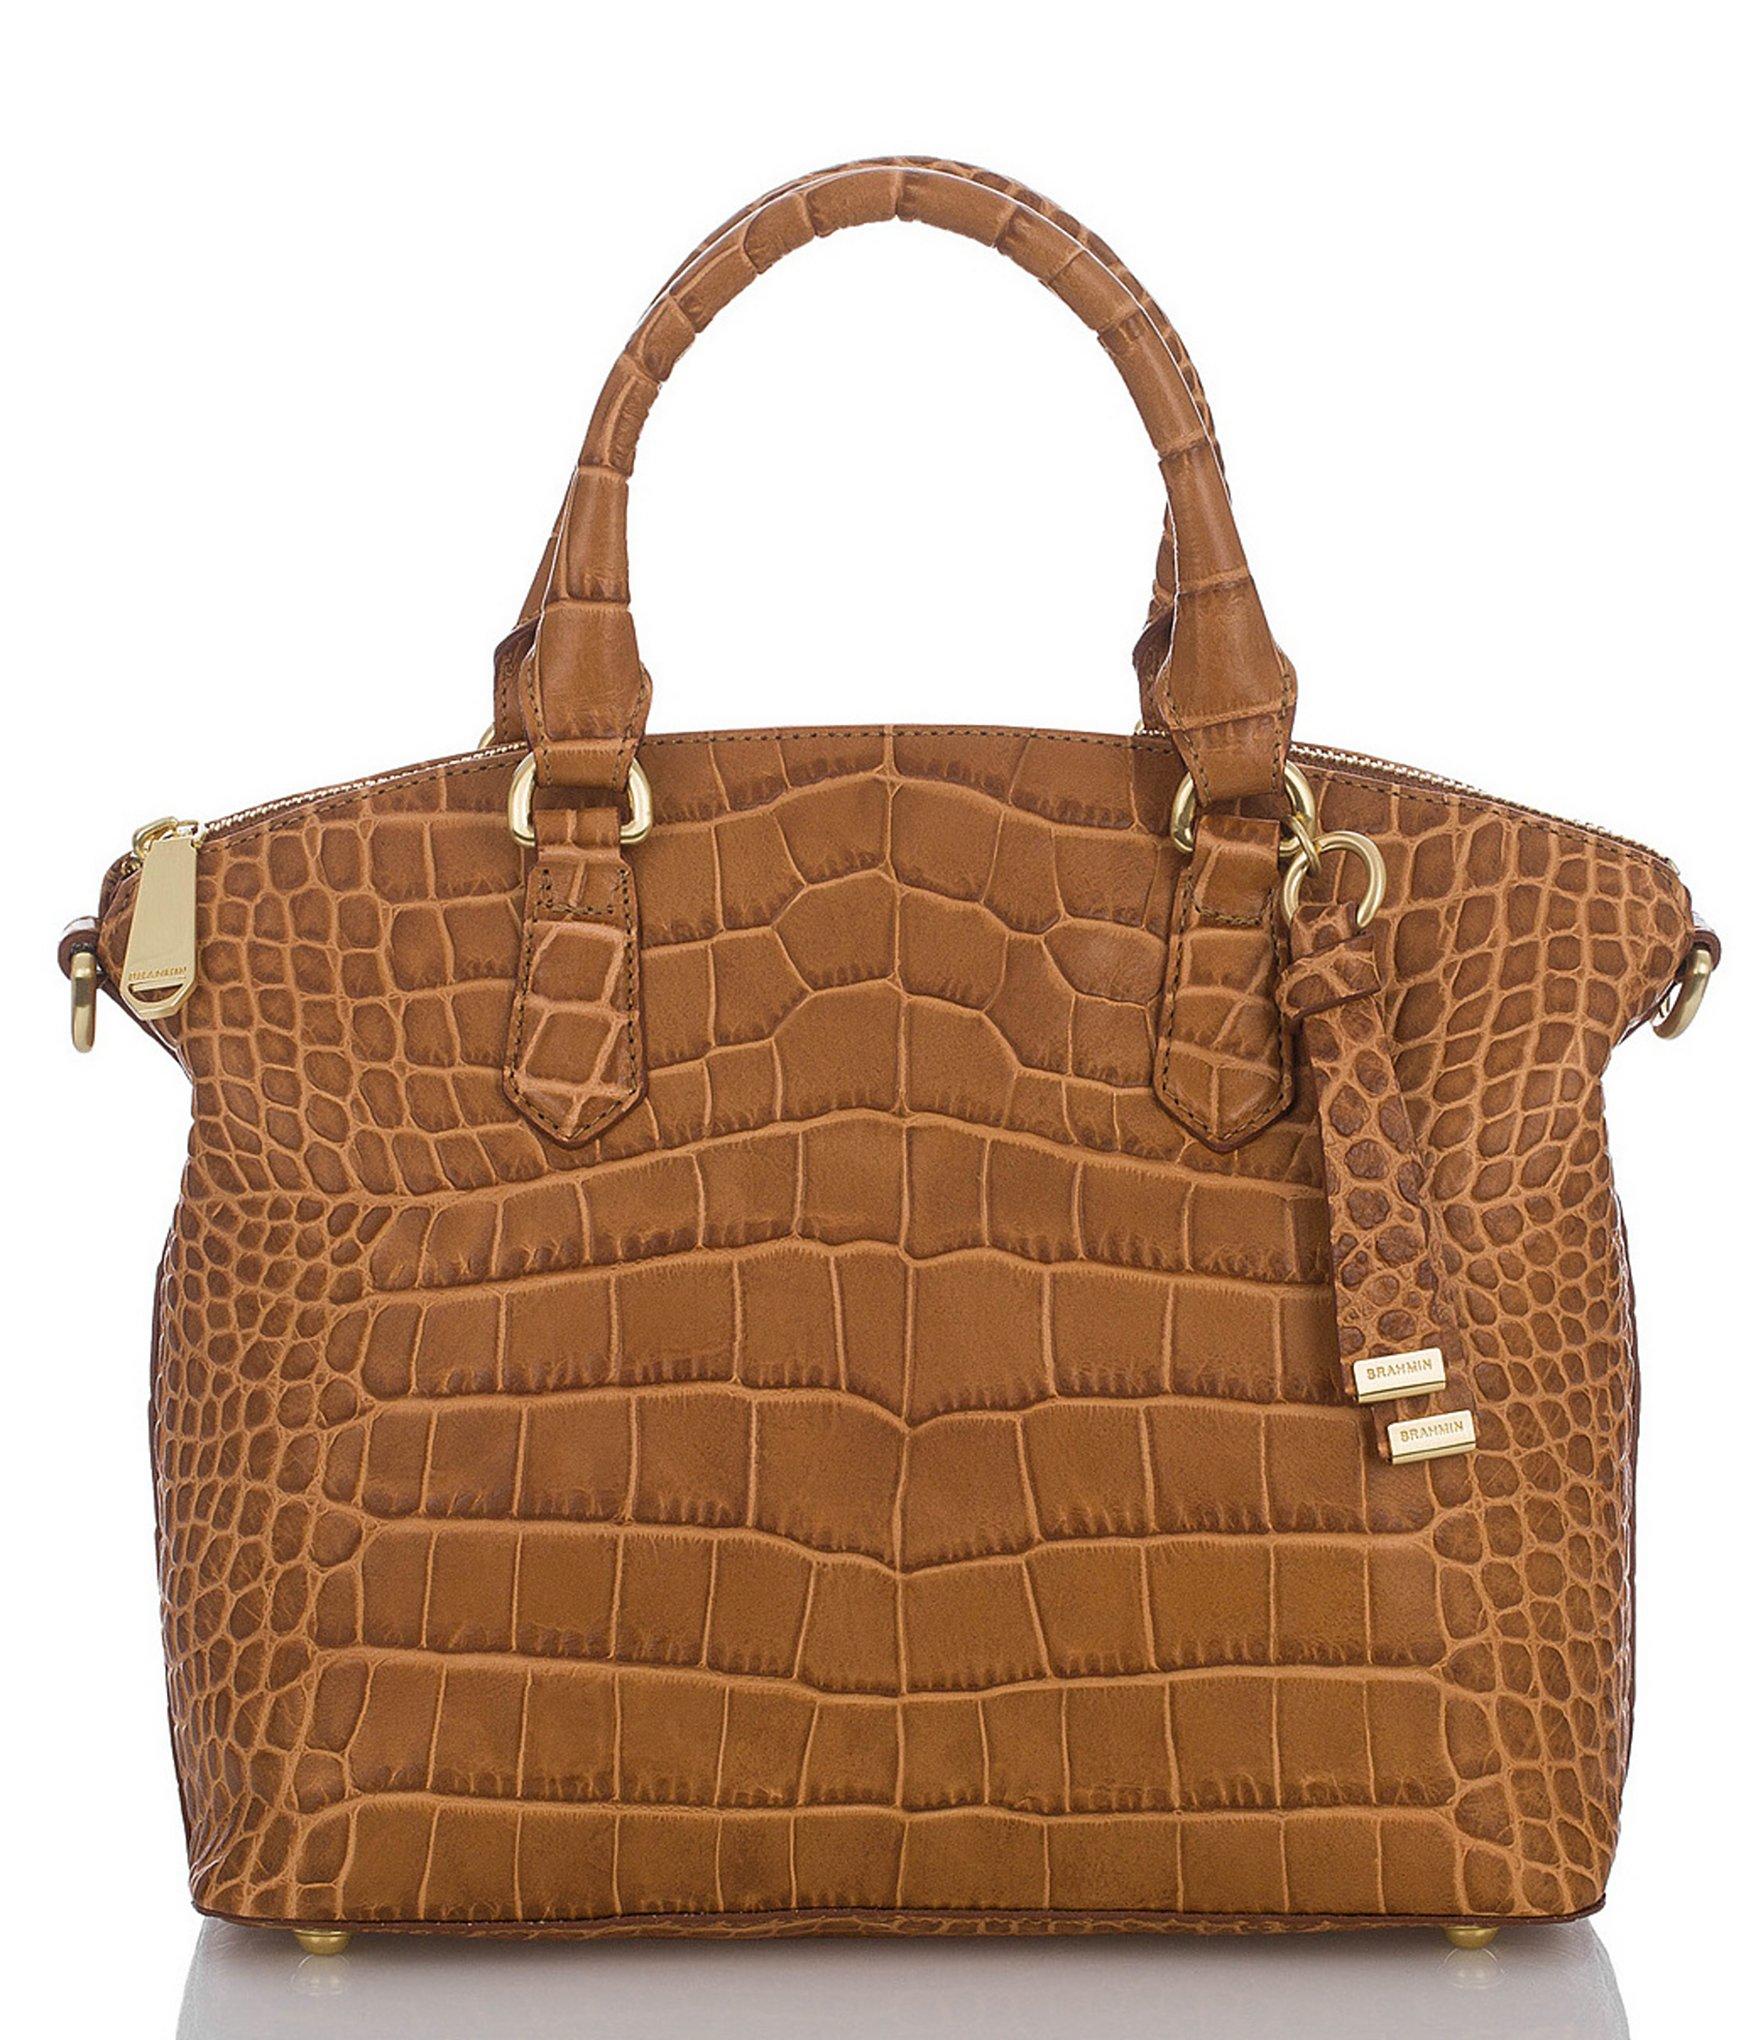 b4e0916fc6ae Satchel Handbags Savannah Georgia | Stanford Center for Opportunity ...